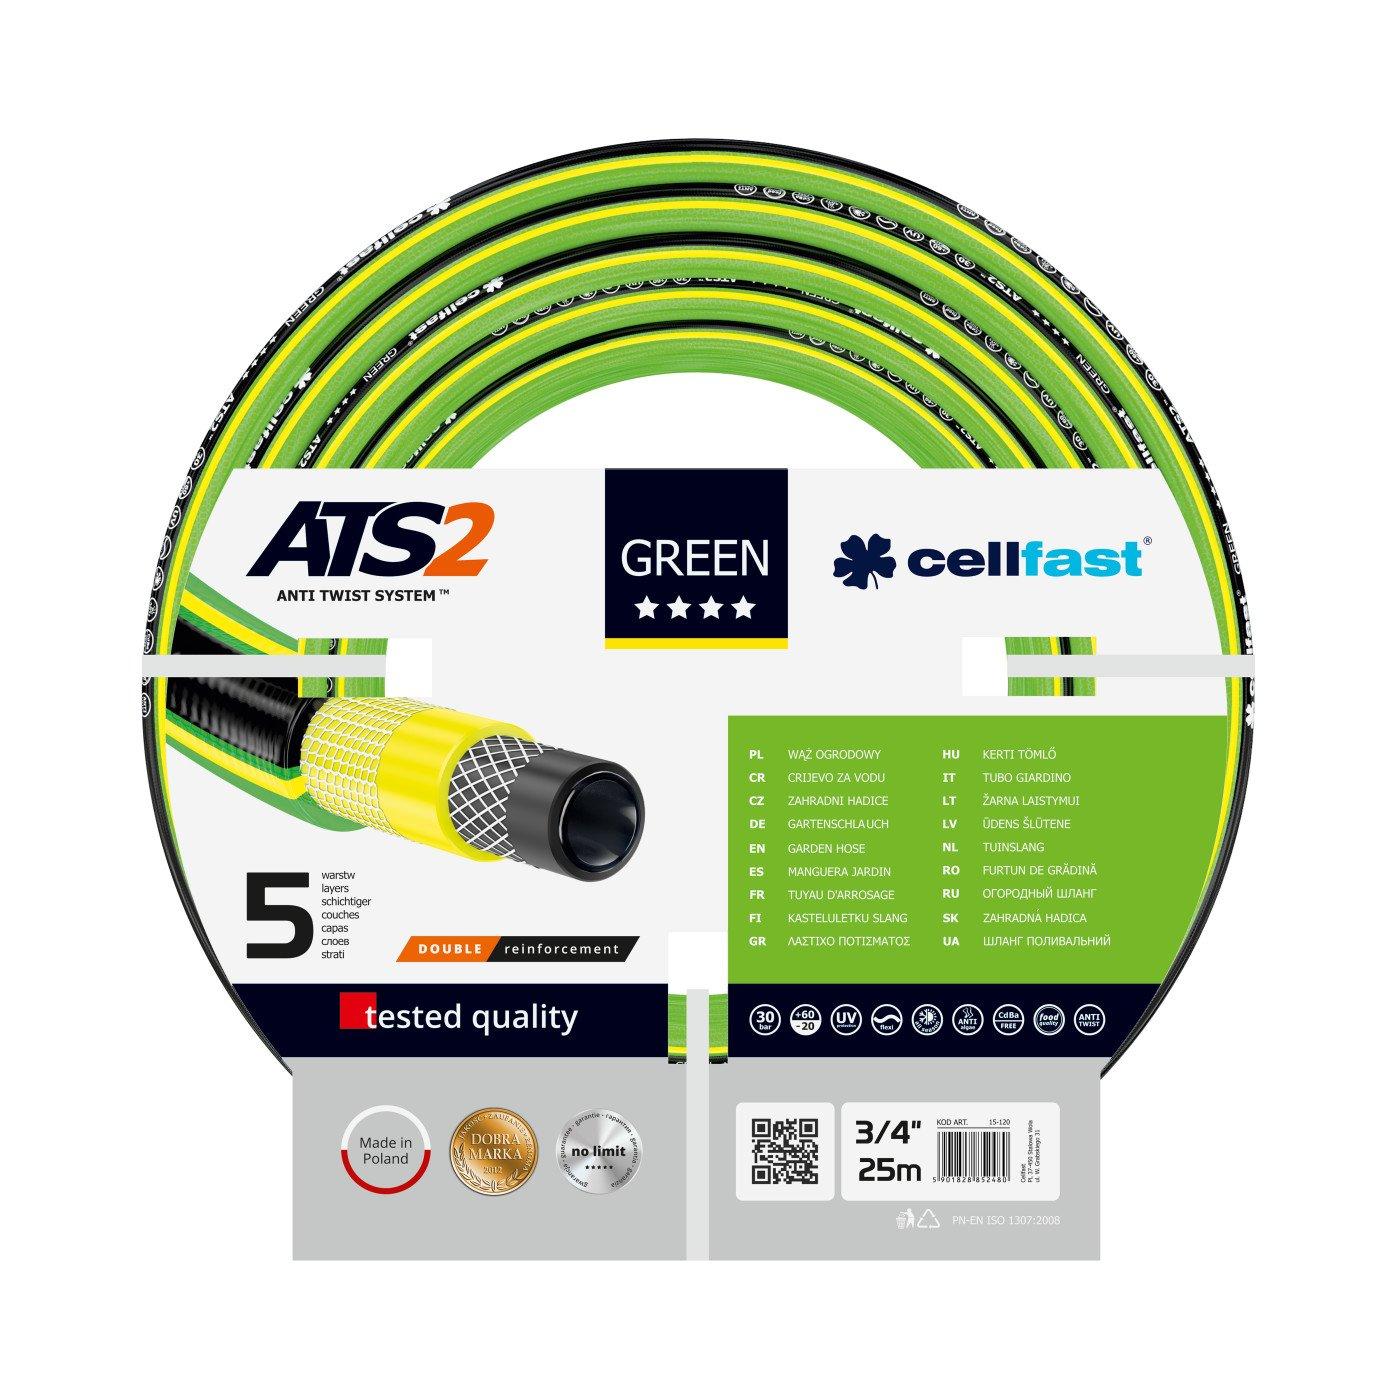 CELLFAST - TUINSLANG - GREEN ATS2™ - 3/4